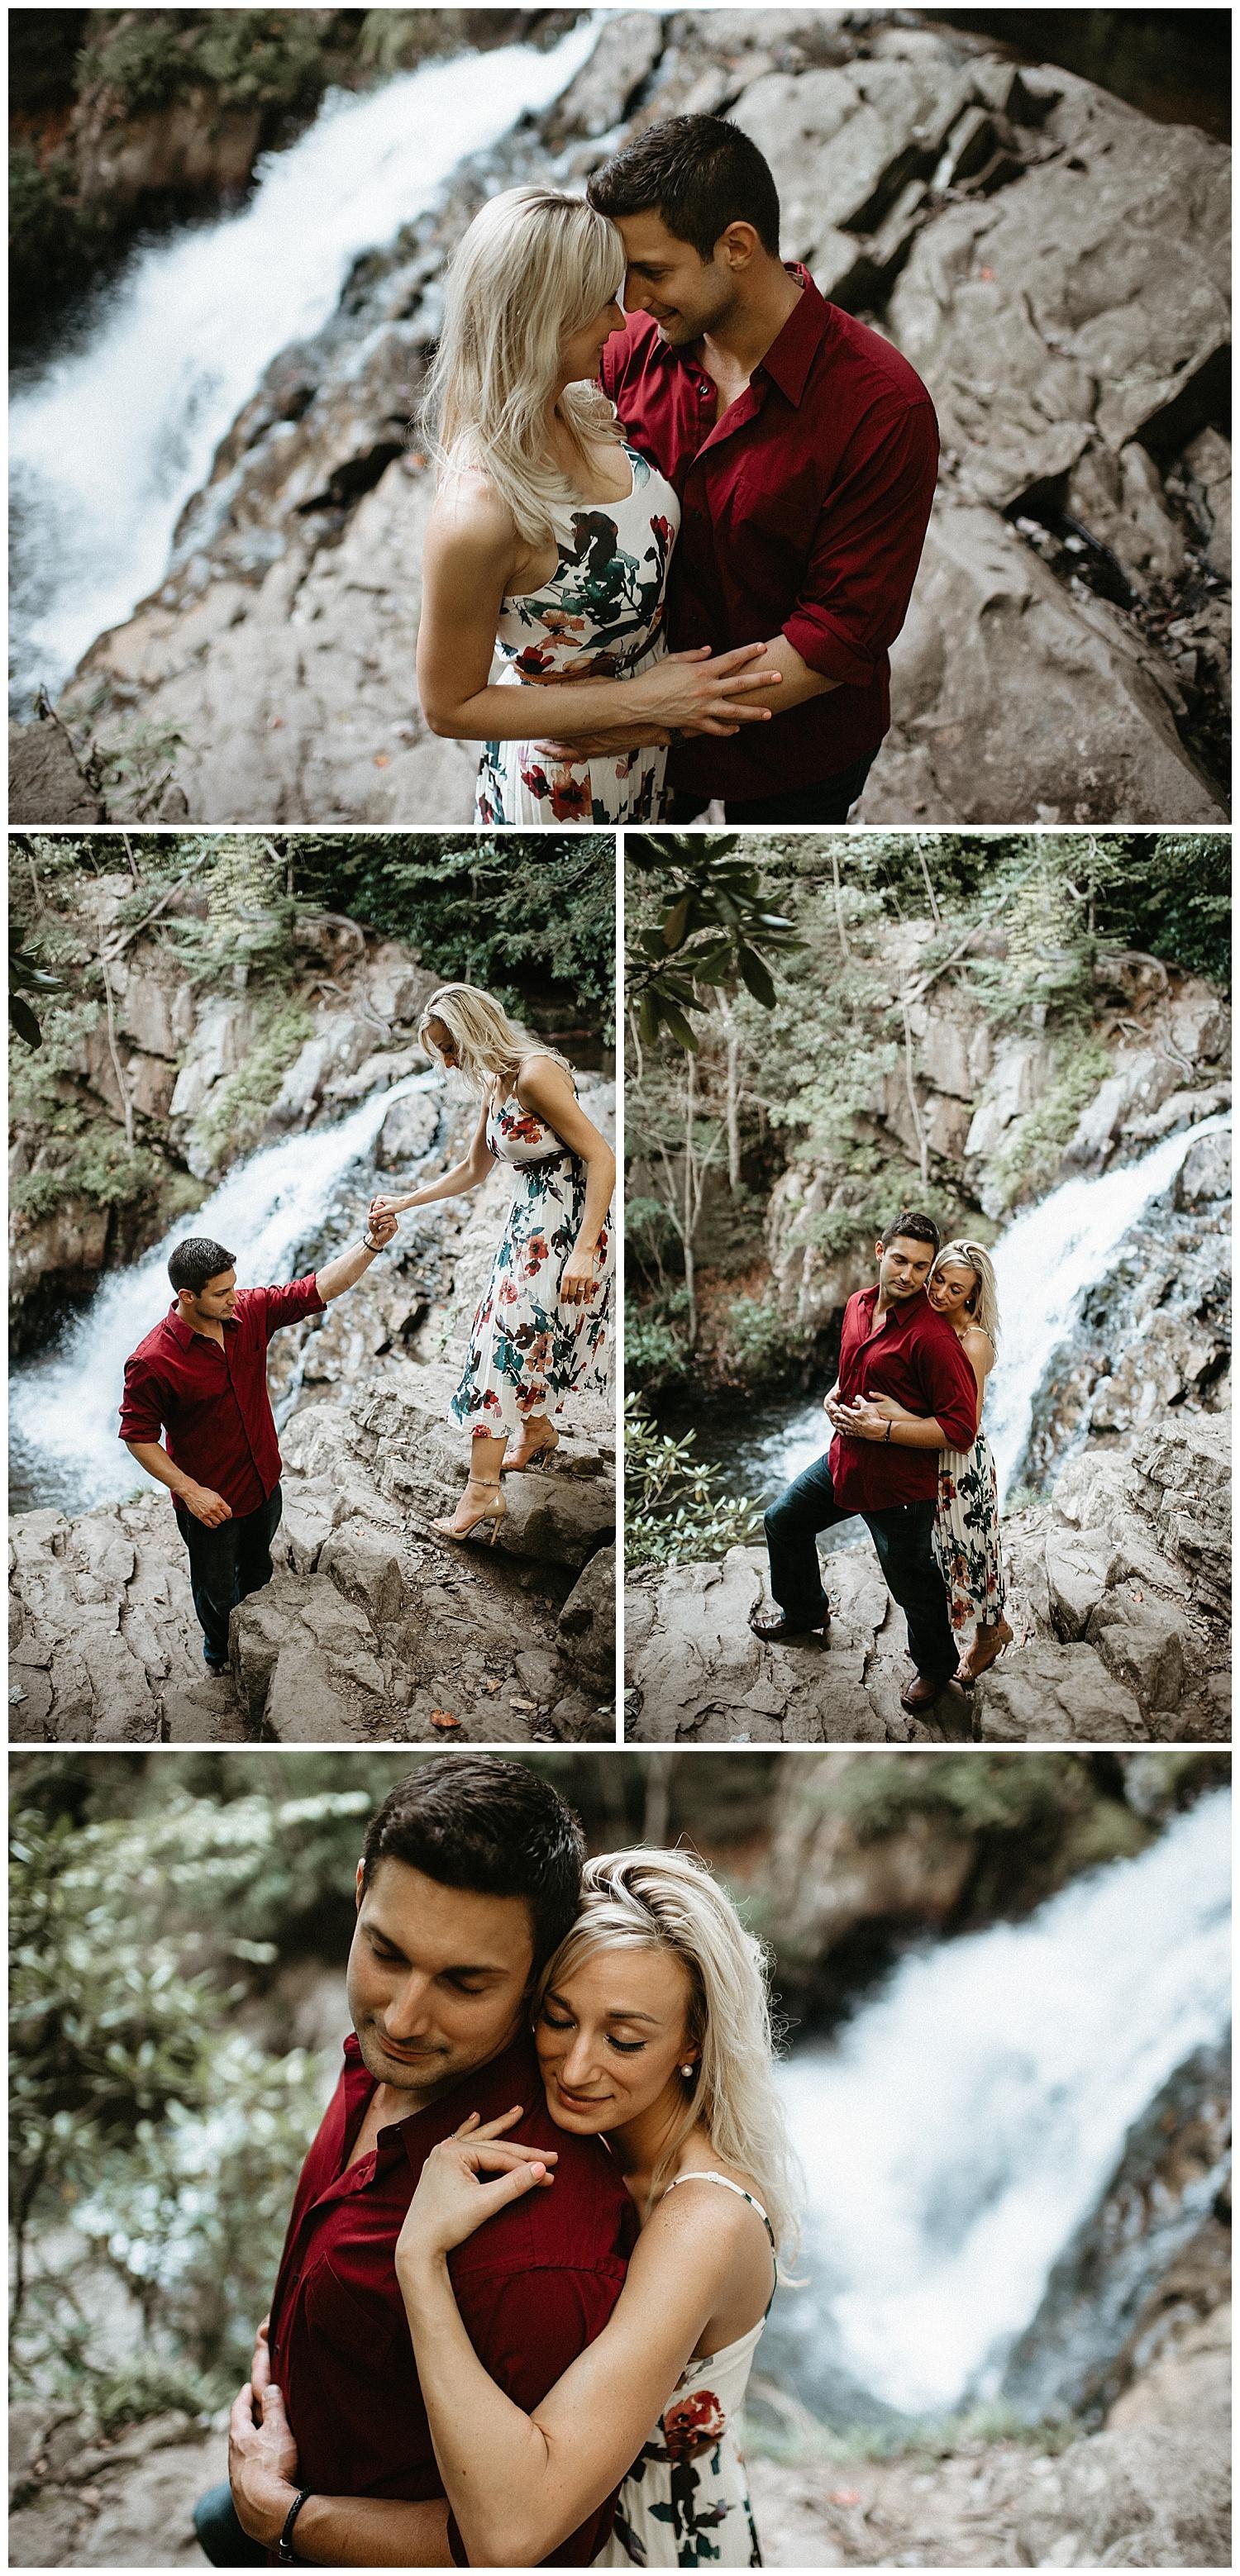 NEPA-Wedding-Engagement-Photographer-at-Hickory-Run-state-park_0003.jpg